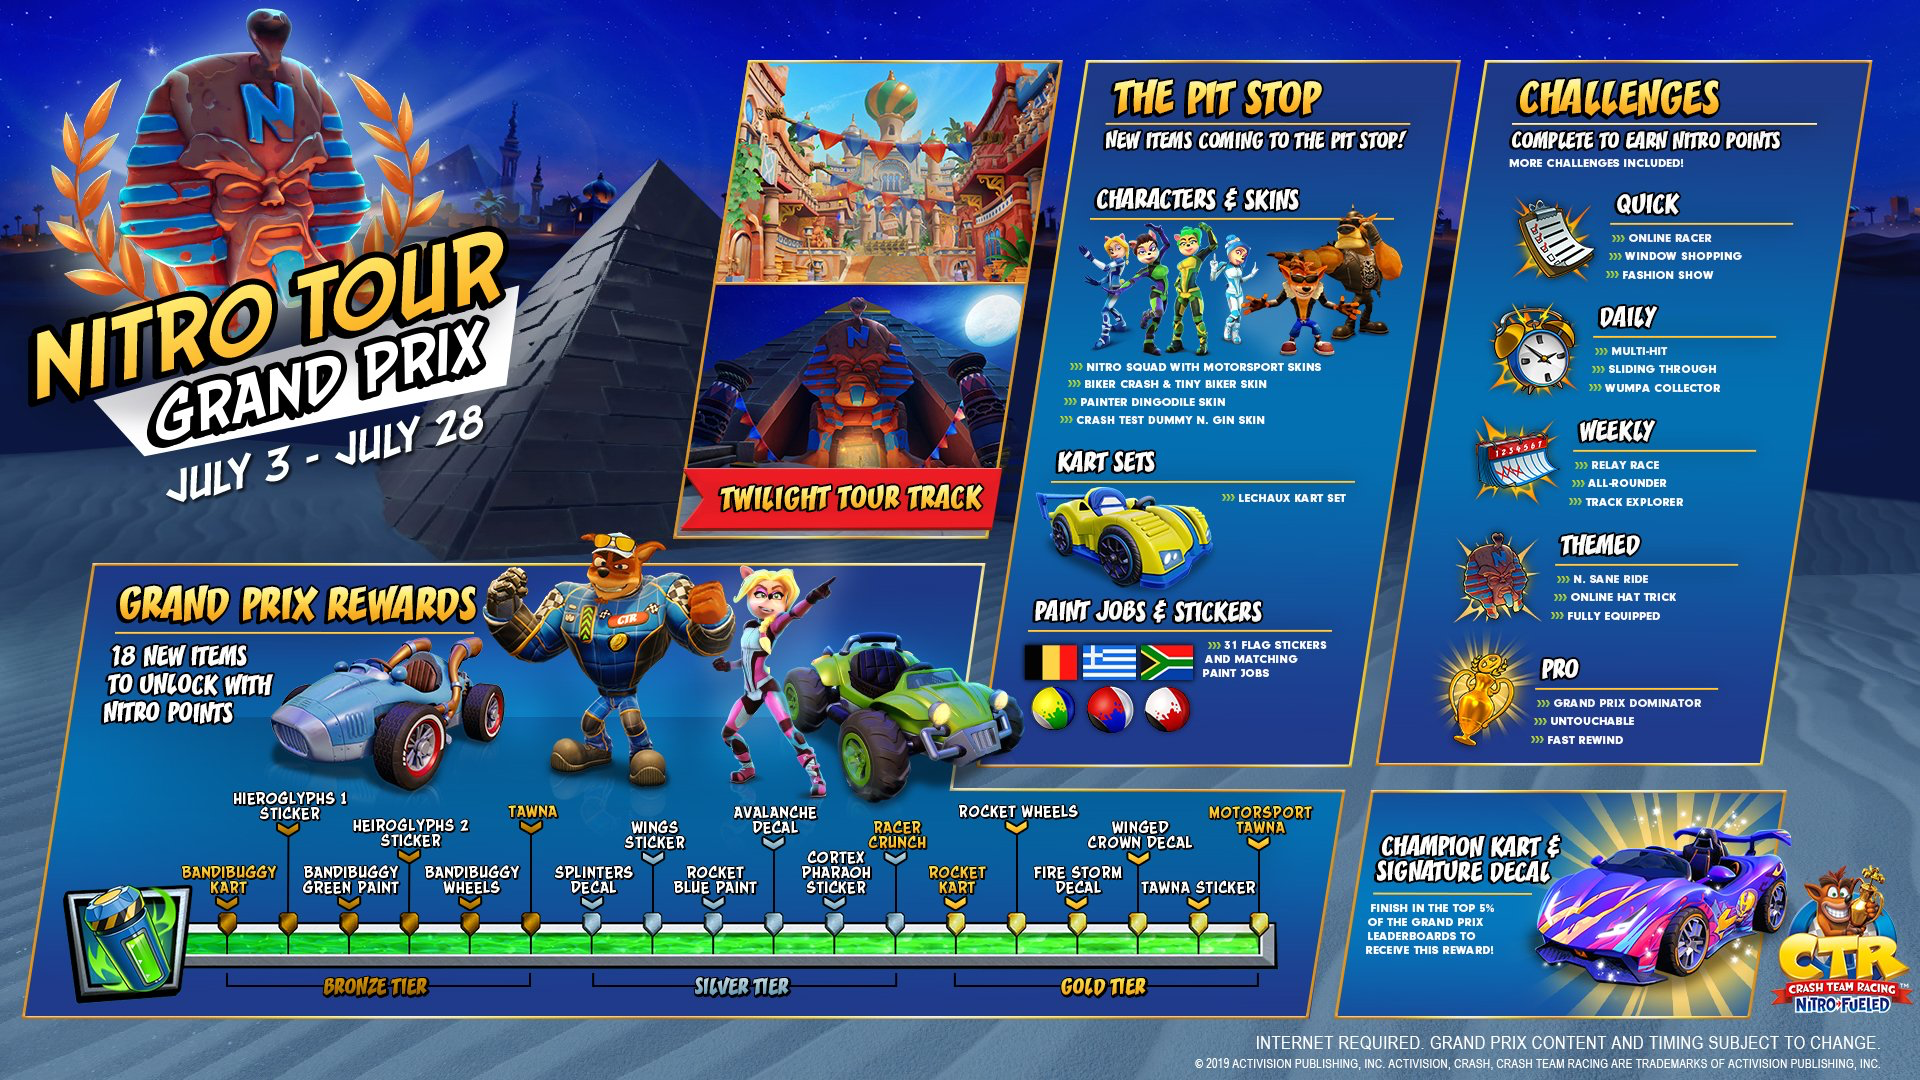 Crash Team Racing: Nitro Tour Grand Prix fully revealed   My